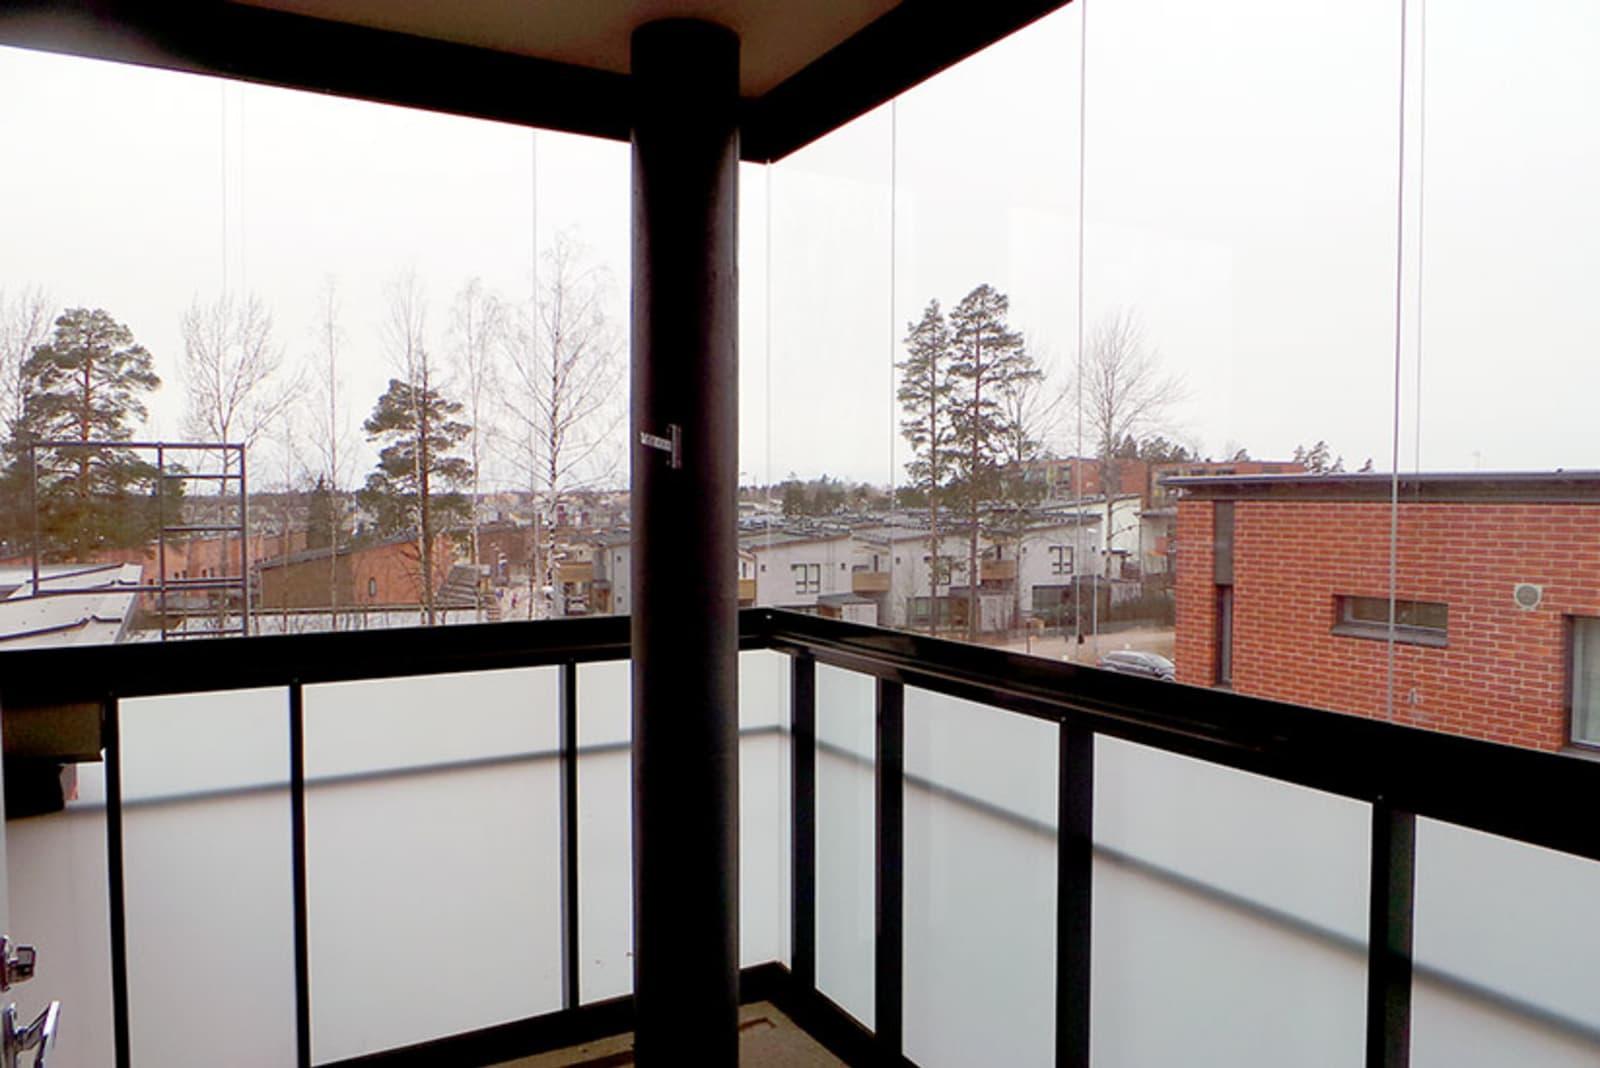 Helsinki, Viikki, Nils Westermarckin kuja 18 D 050